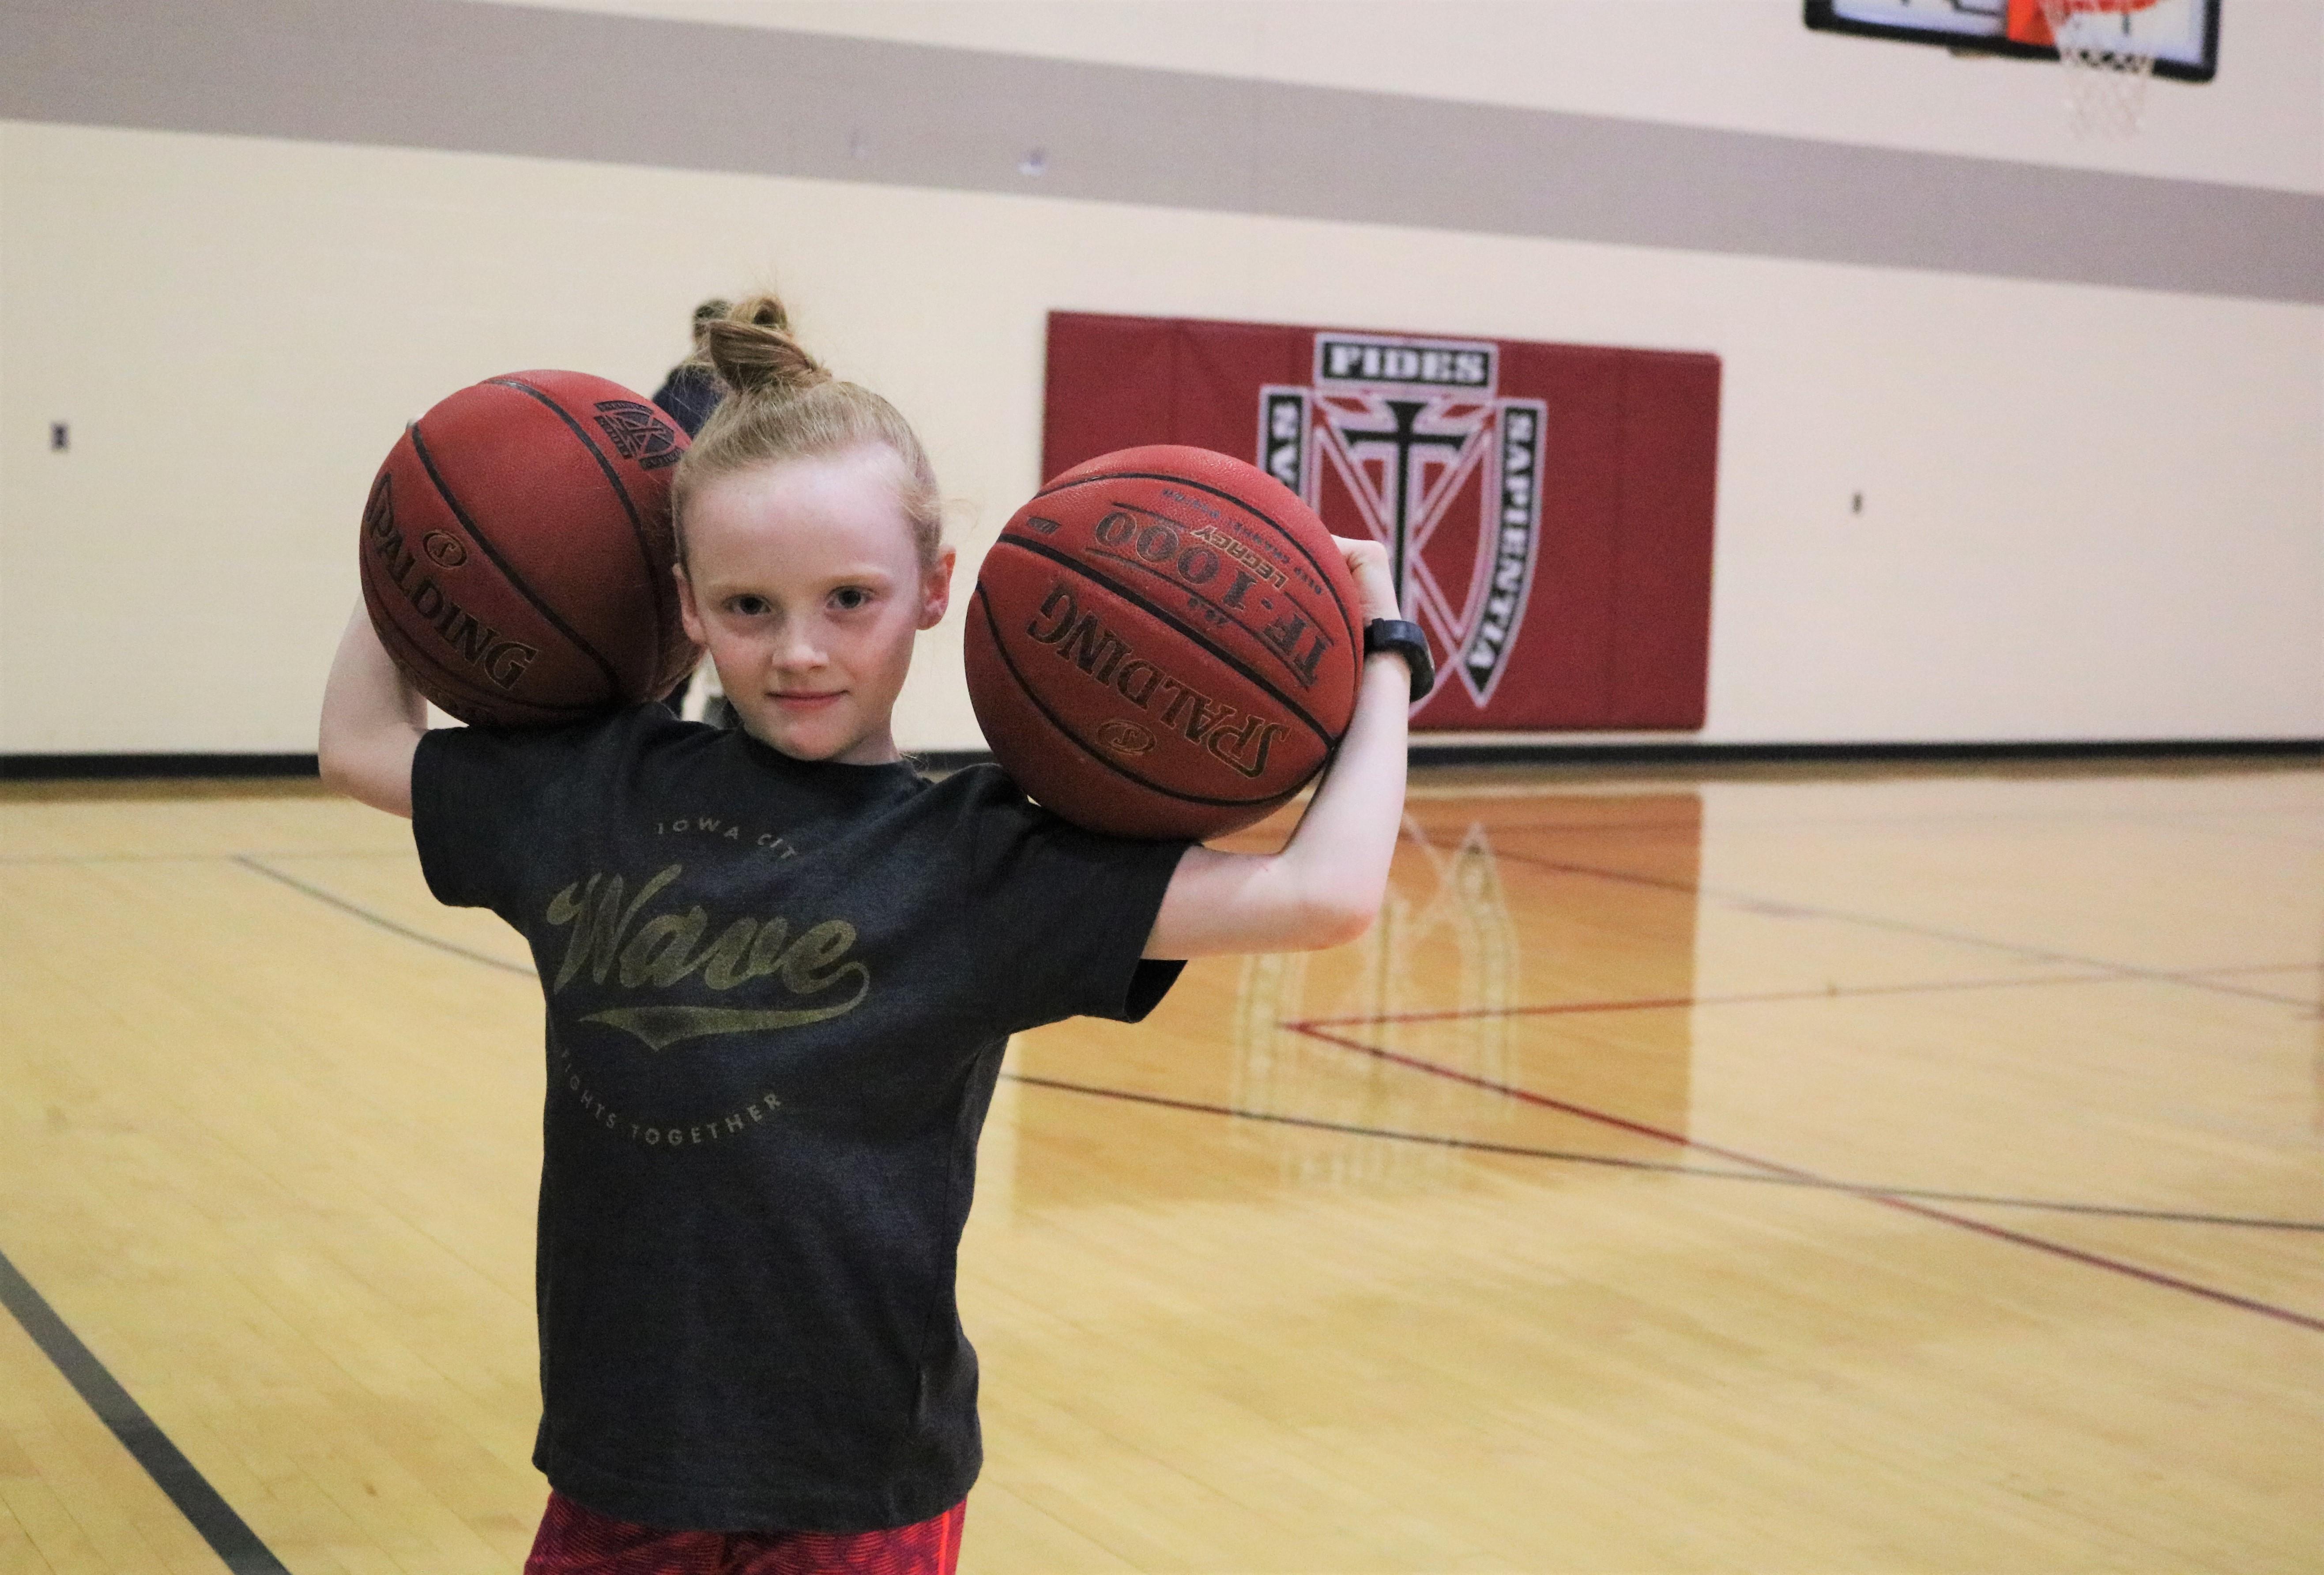 Dowling Basketball Clinic